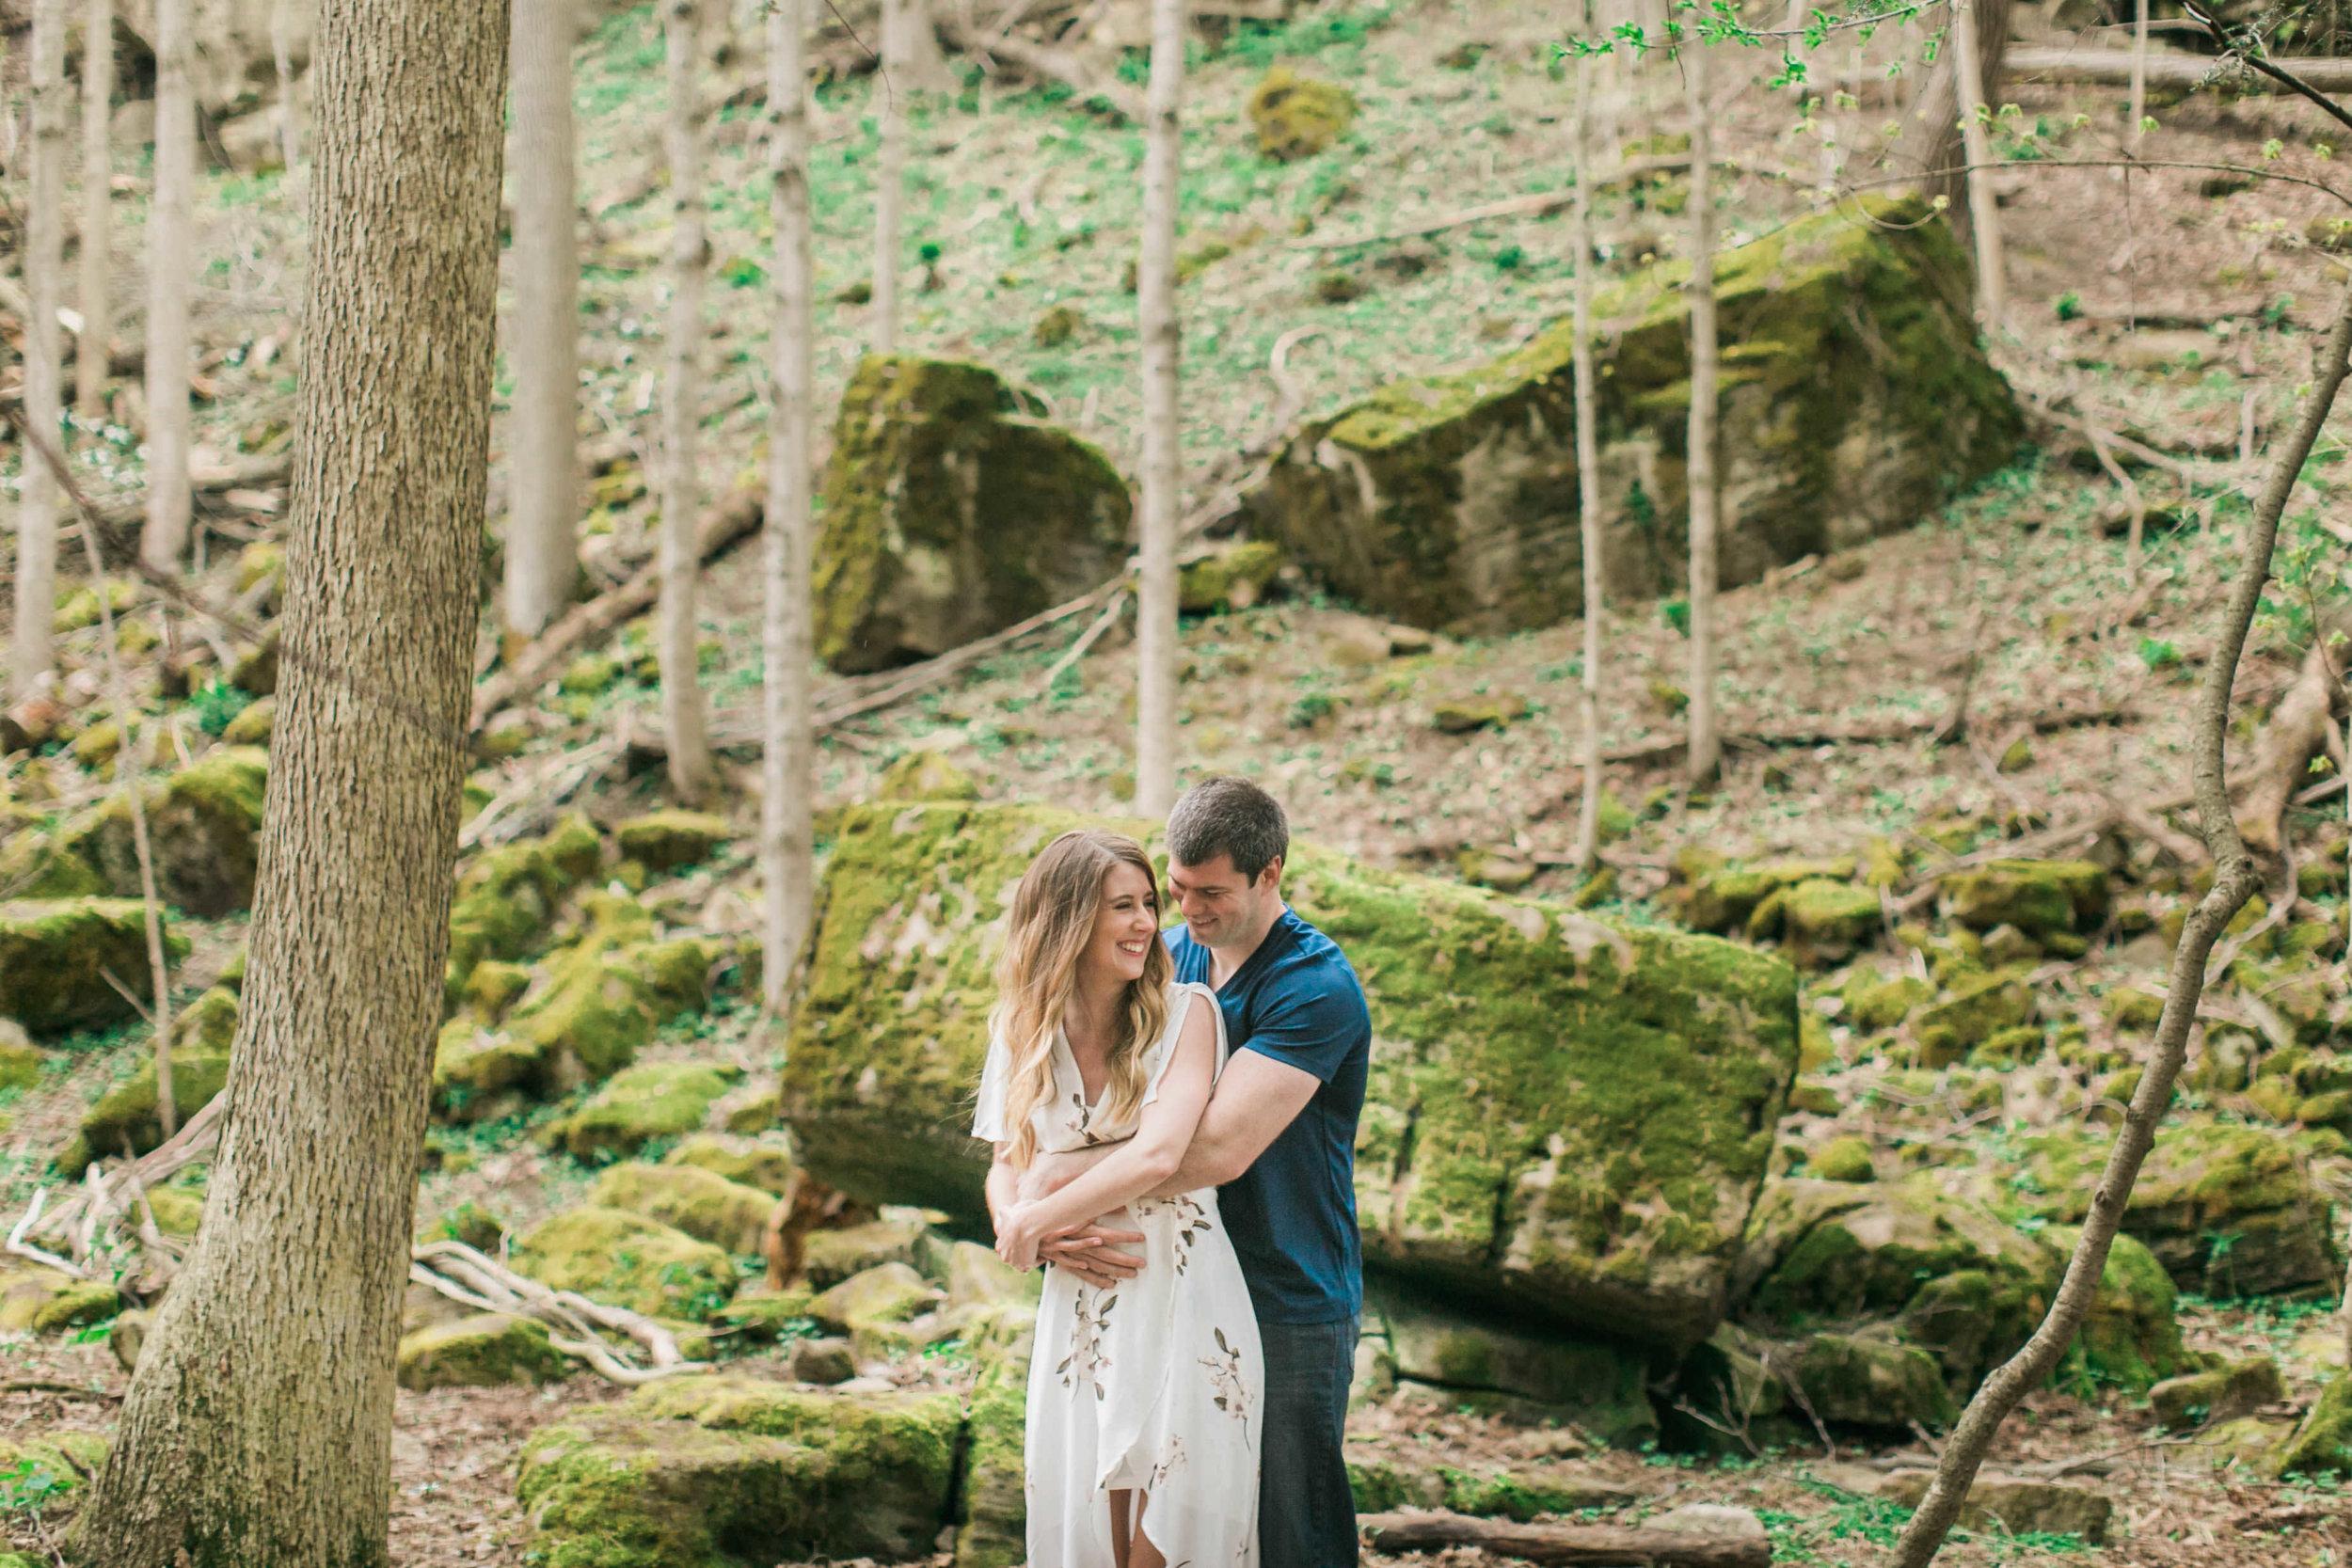 Holly___Ian___Engagement_Session___Daniel_Ricci_Wedding_Photography_57.jpg